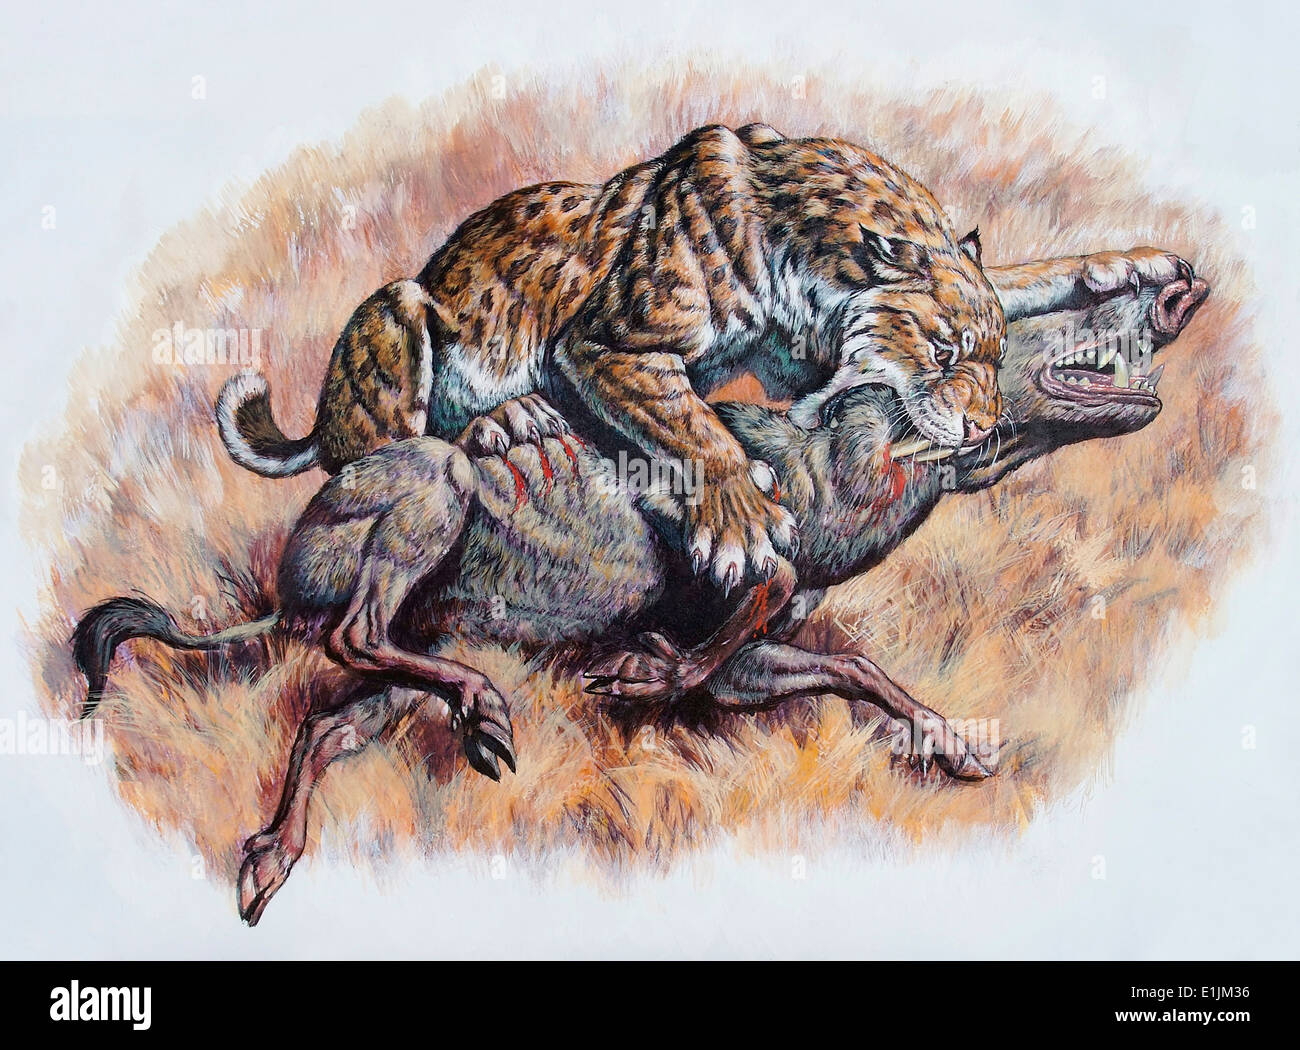 Smilodon Dirk Sabertooth Killing A Platygonus Peccary